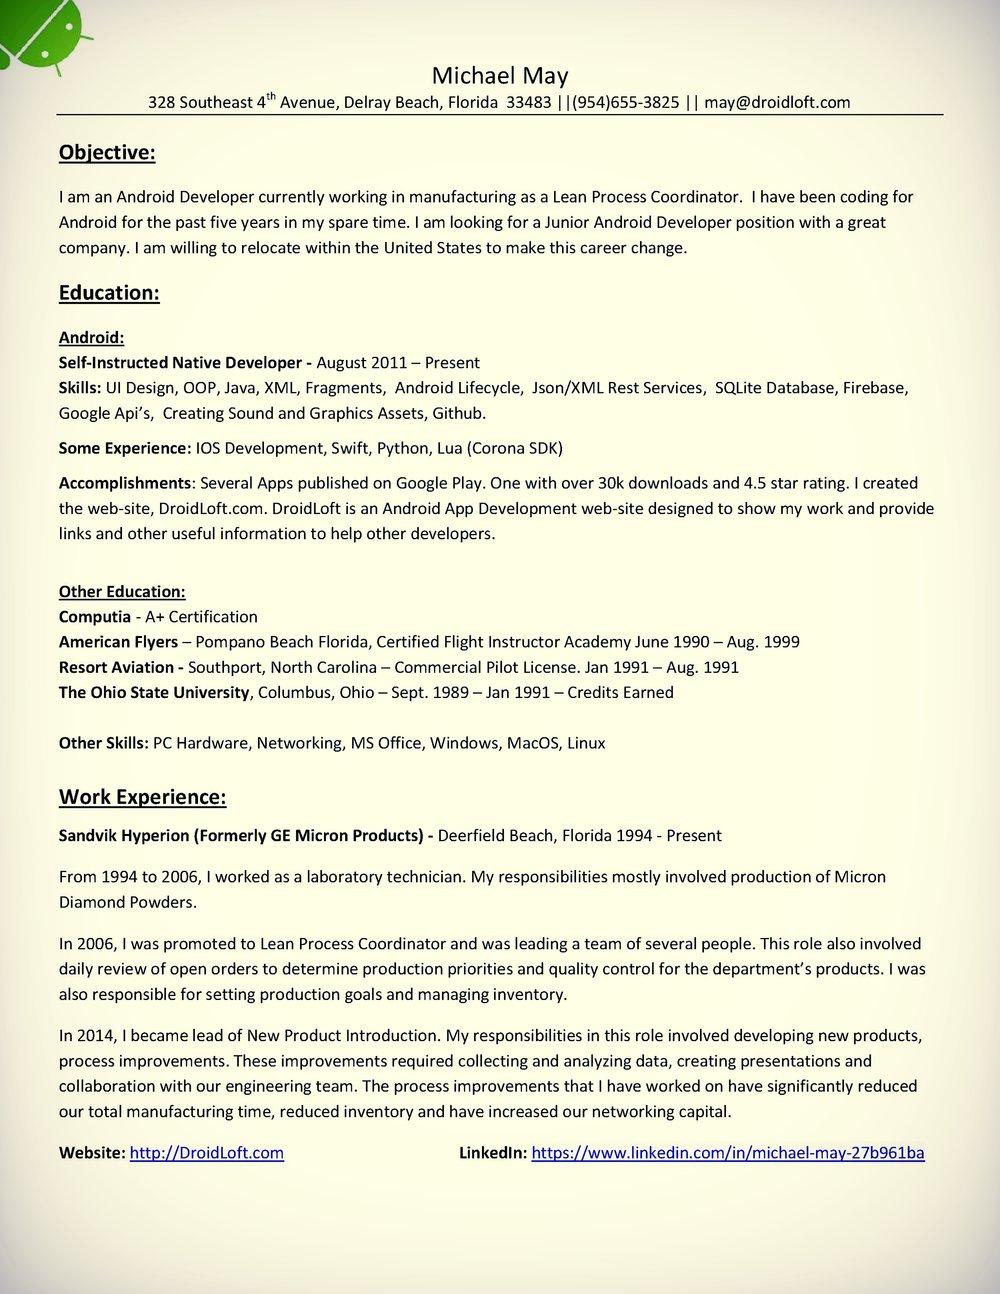 Resume Droidloft